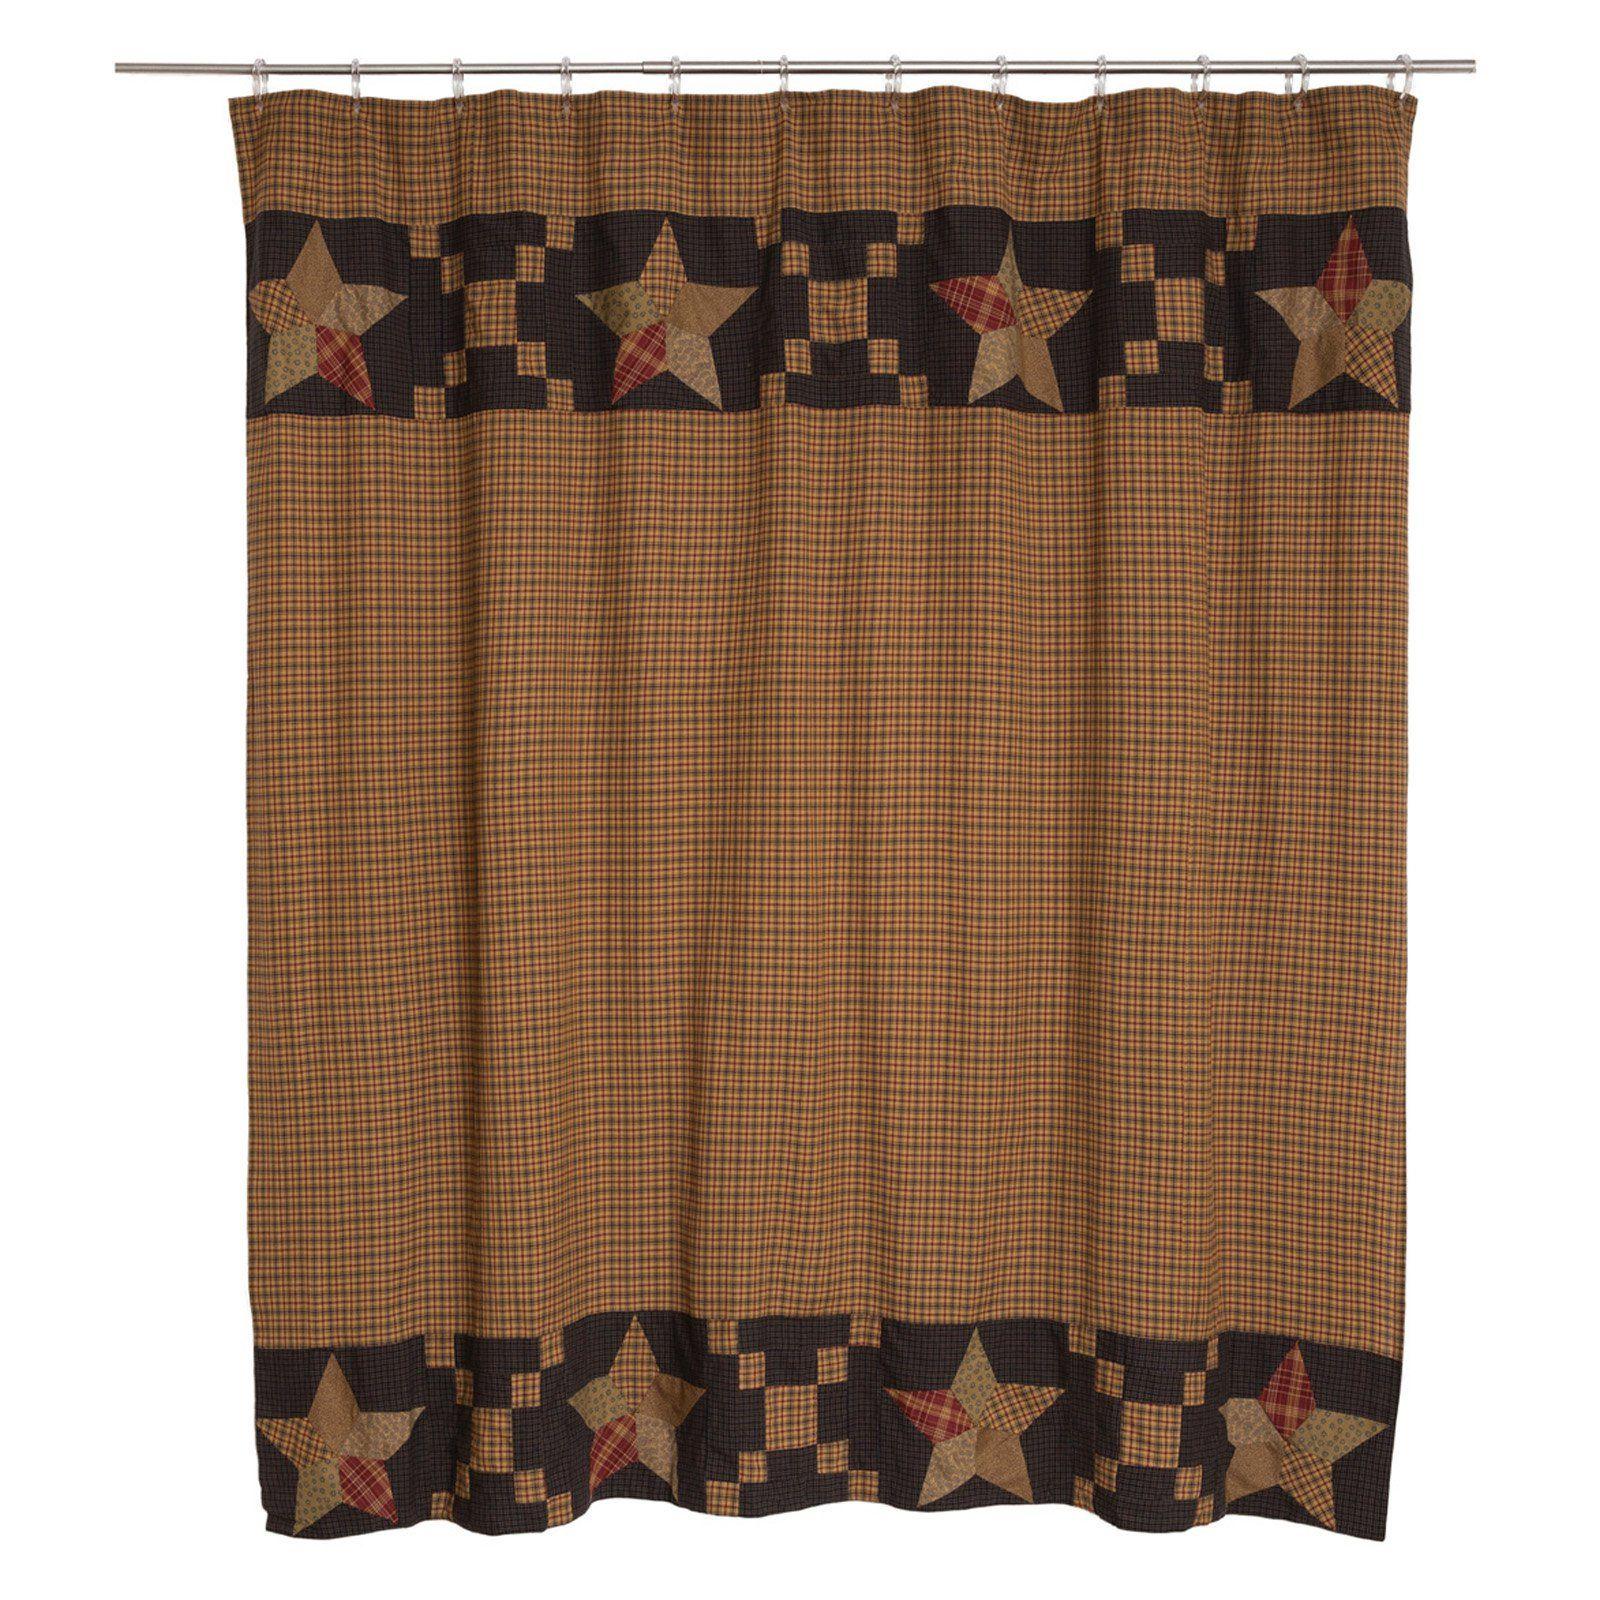 Vhc Arlington Shower Curtain Patchwork Star Border Primitive Bathrooms Fabric Shower Curtains Primitive Shower Curtains